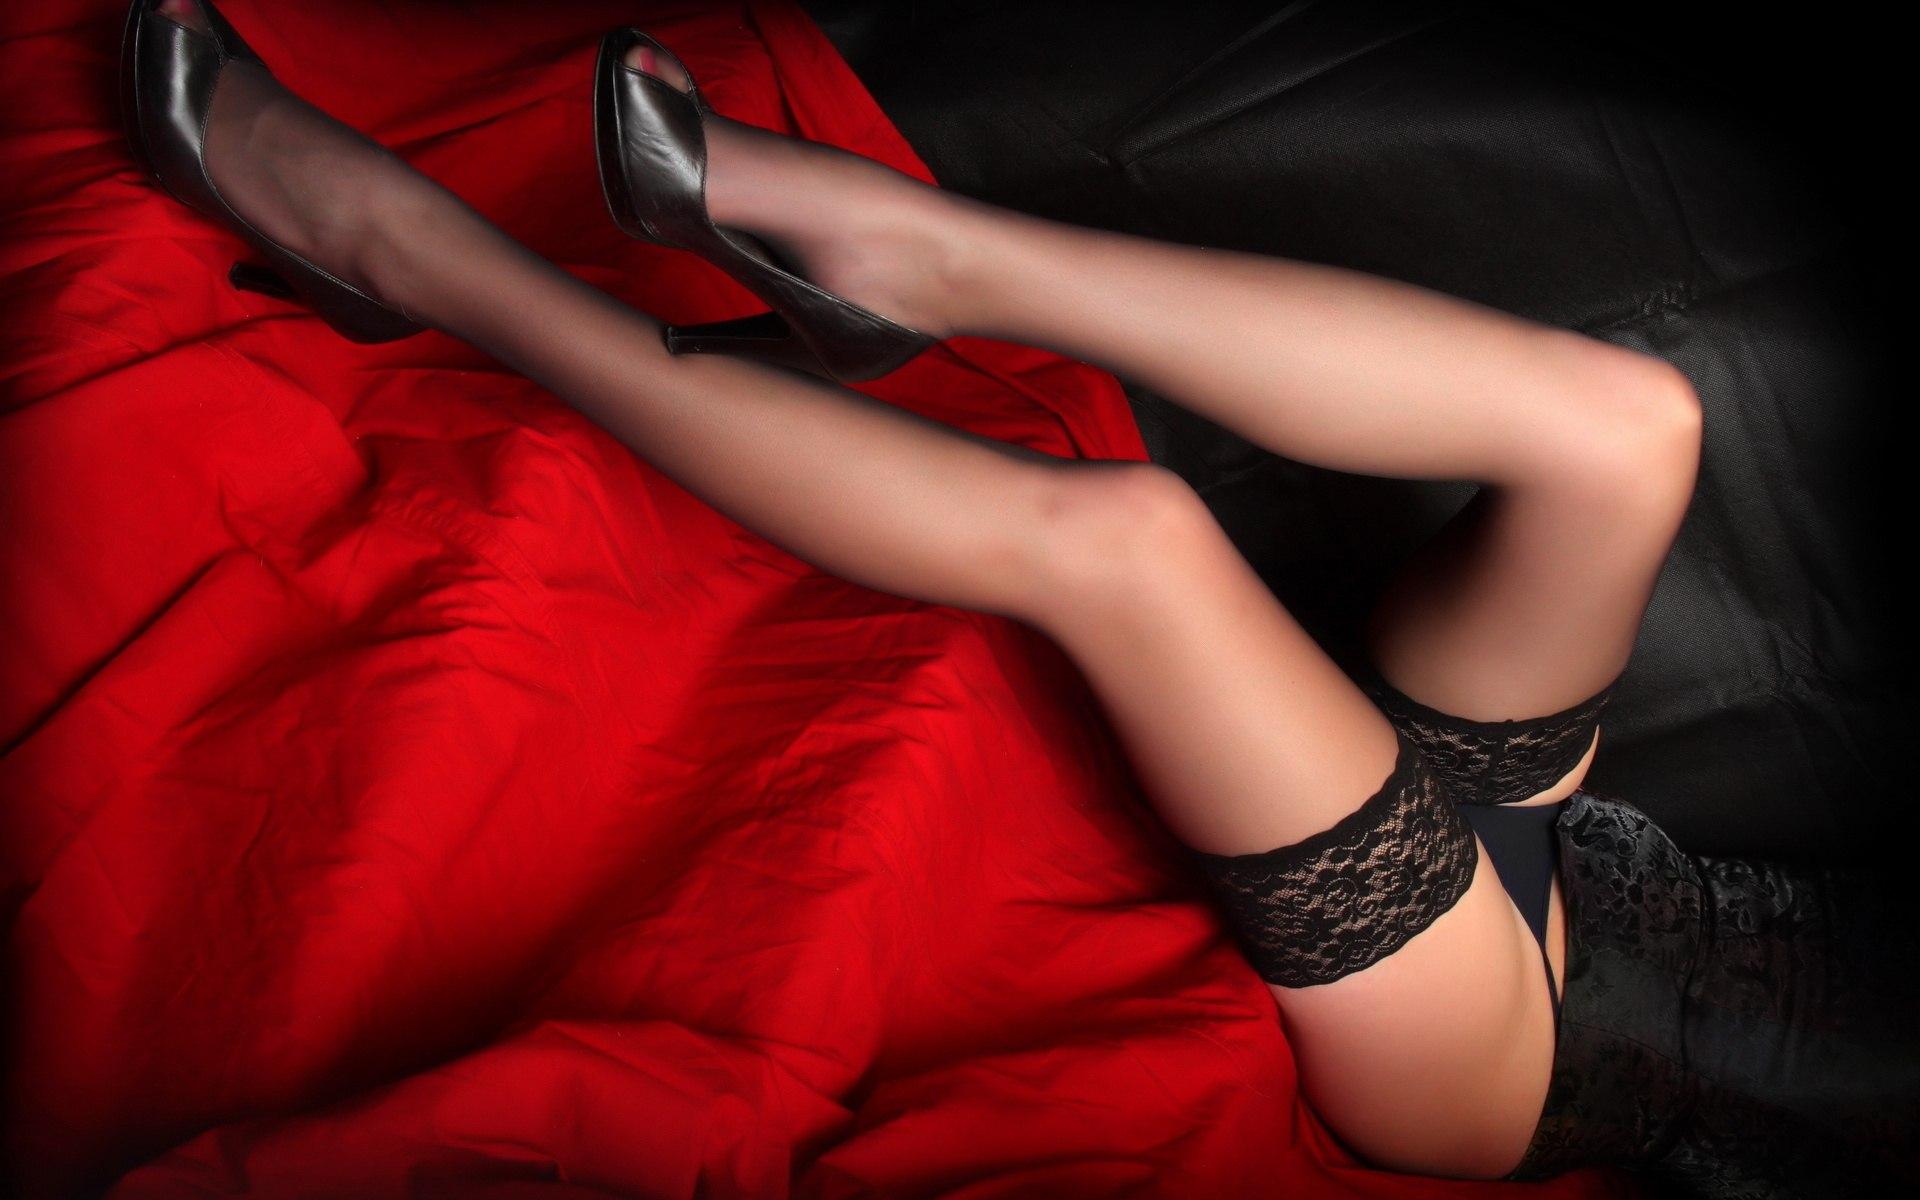 Строиненькие ножки юбки фото 20 фотография